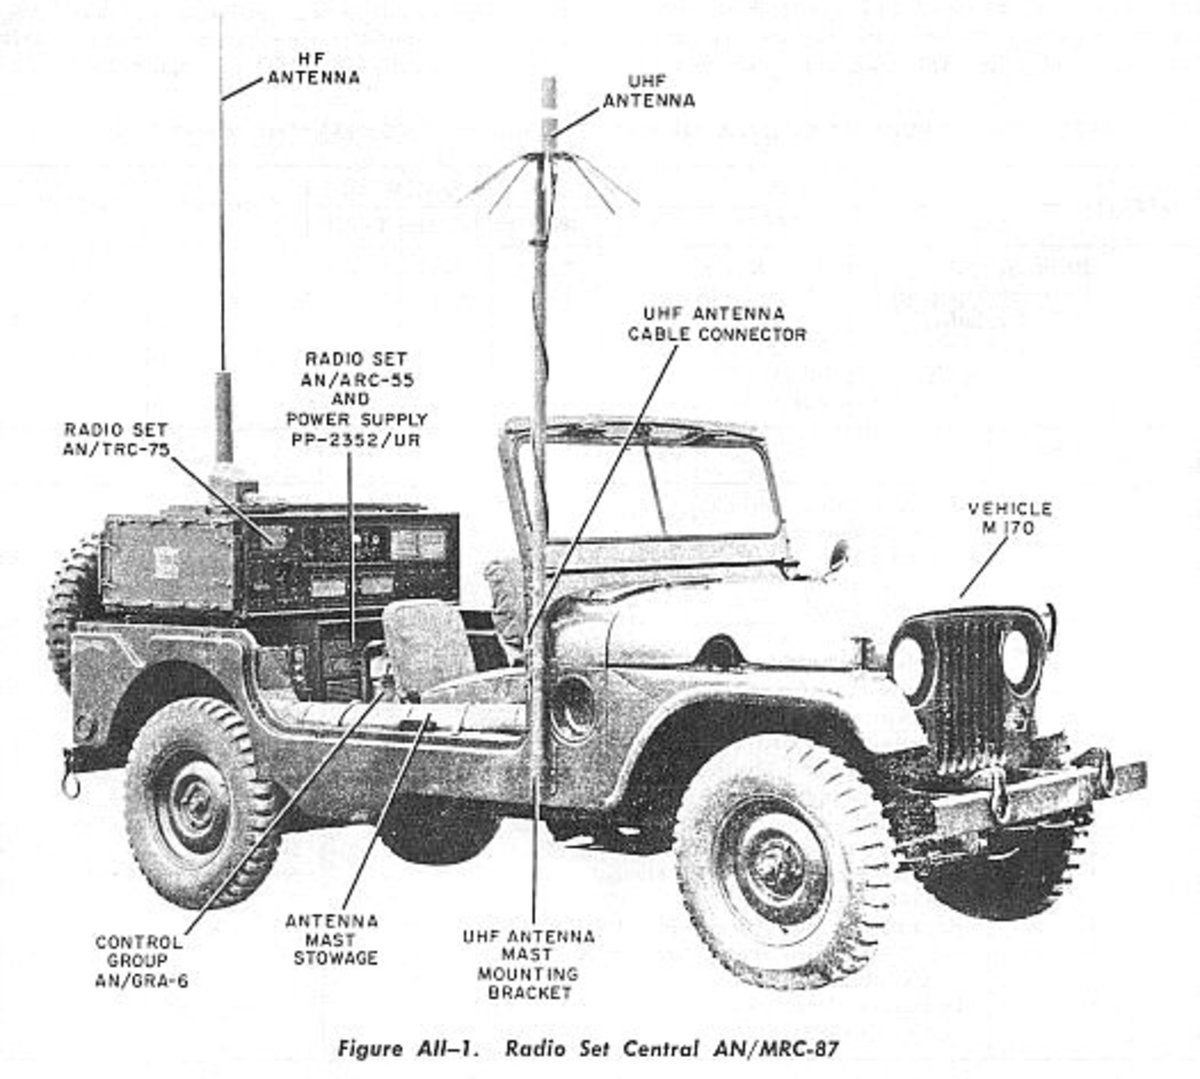 Manual illustration of the AN/MRC-87 Radio Set Control